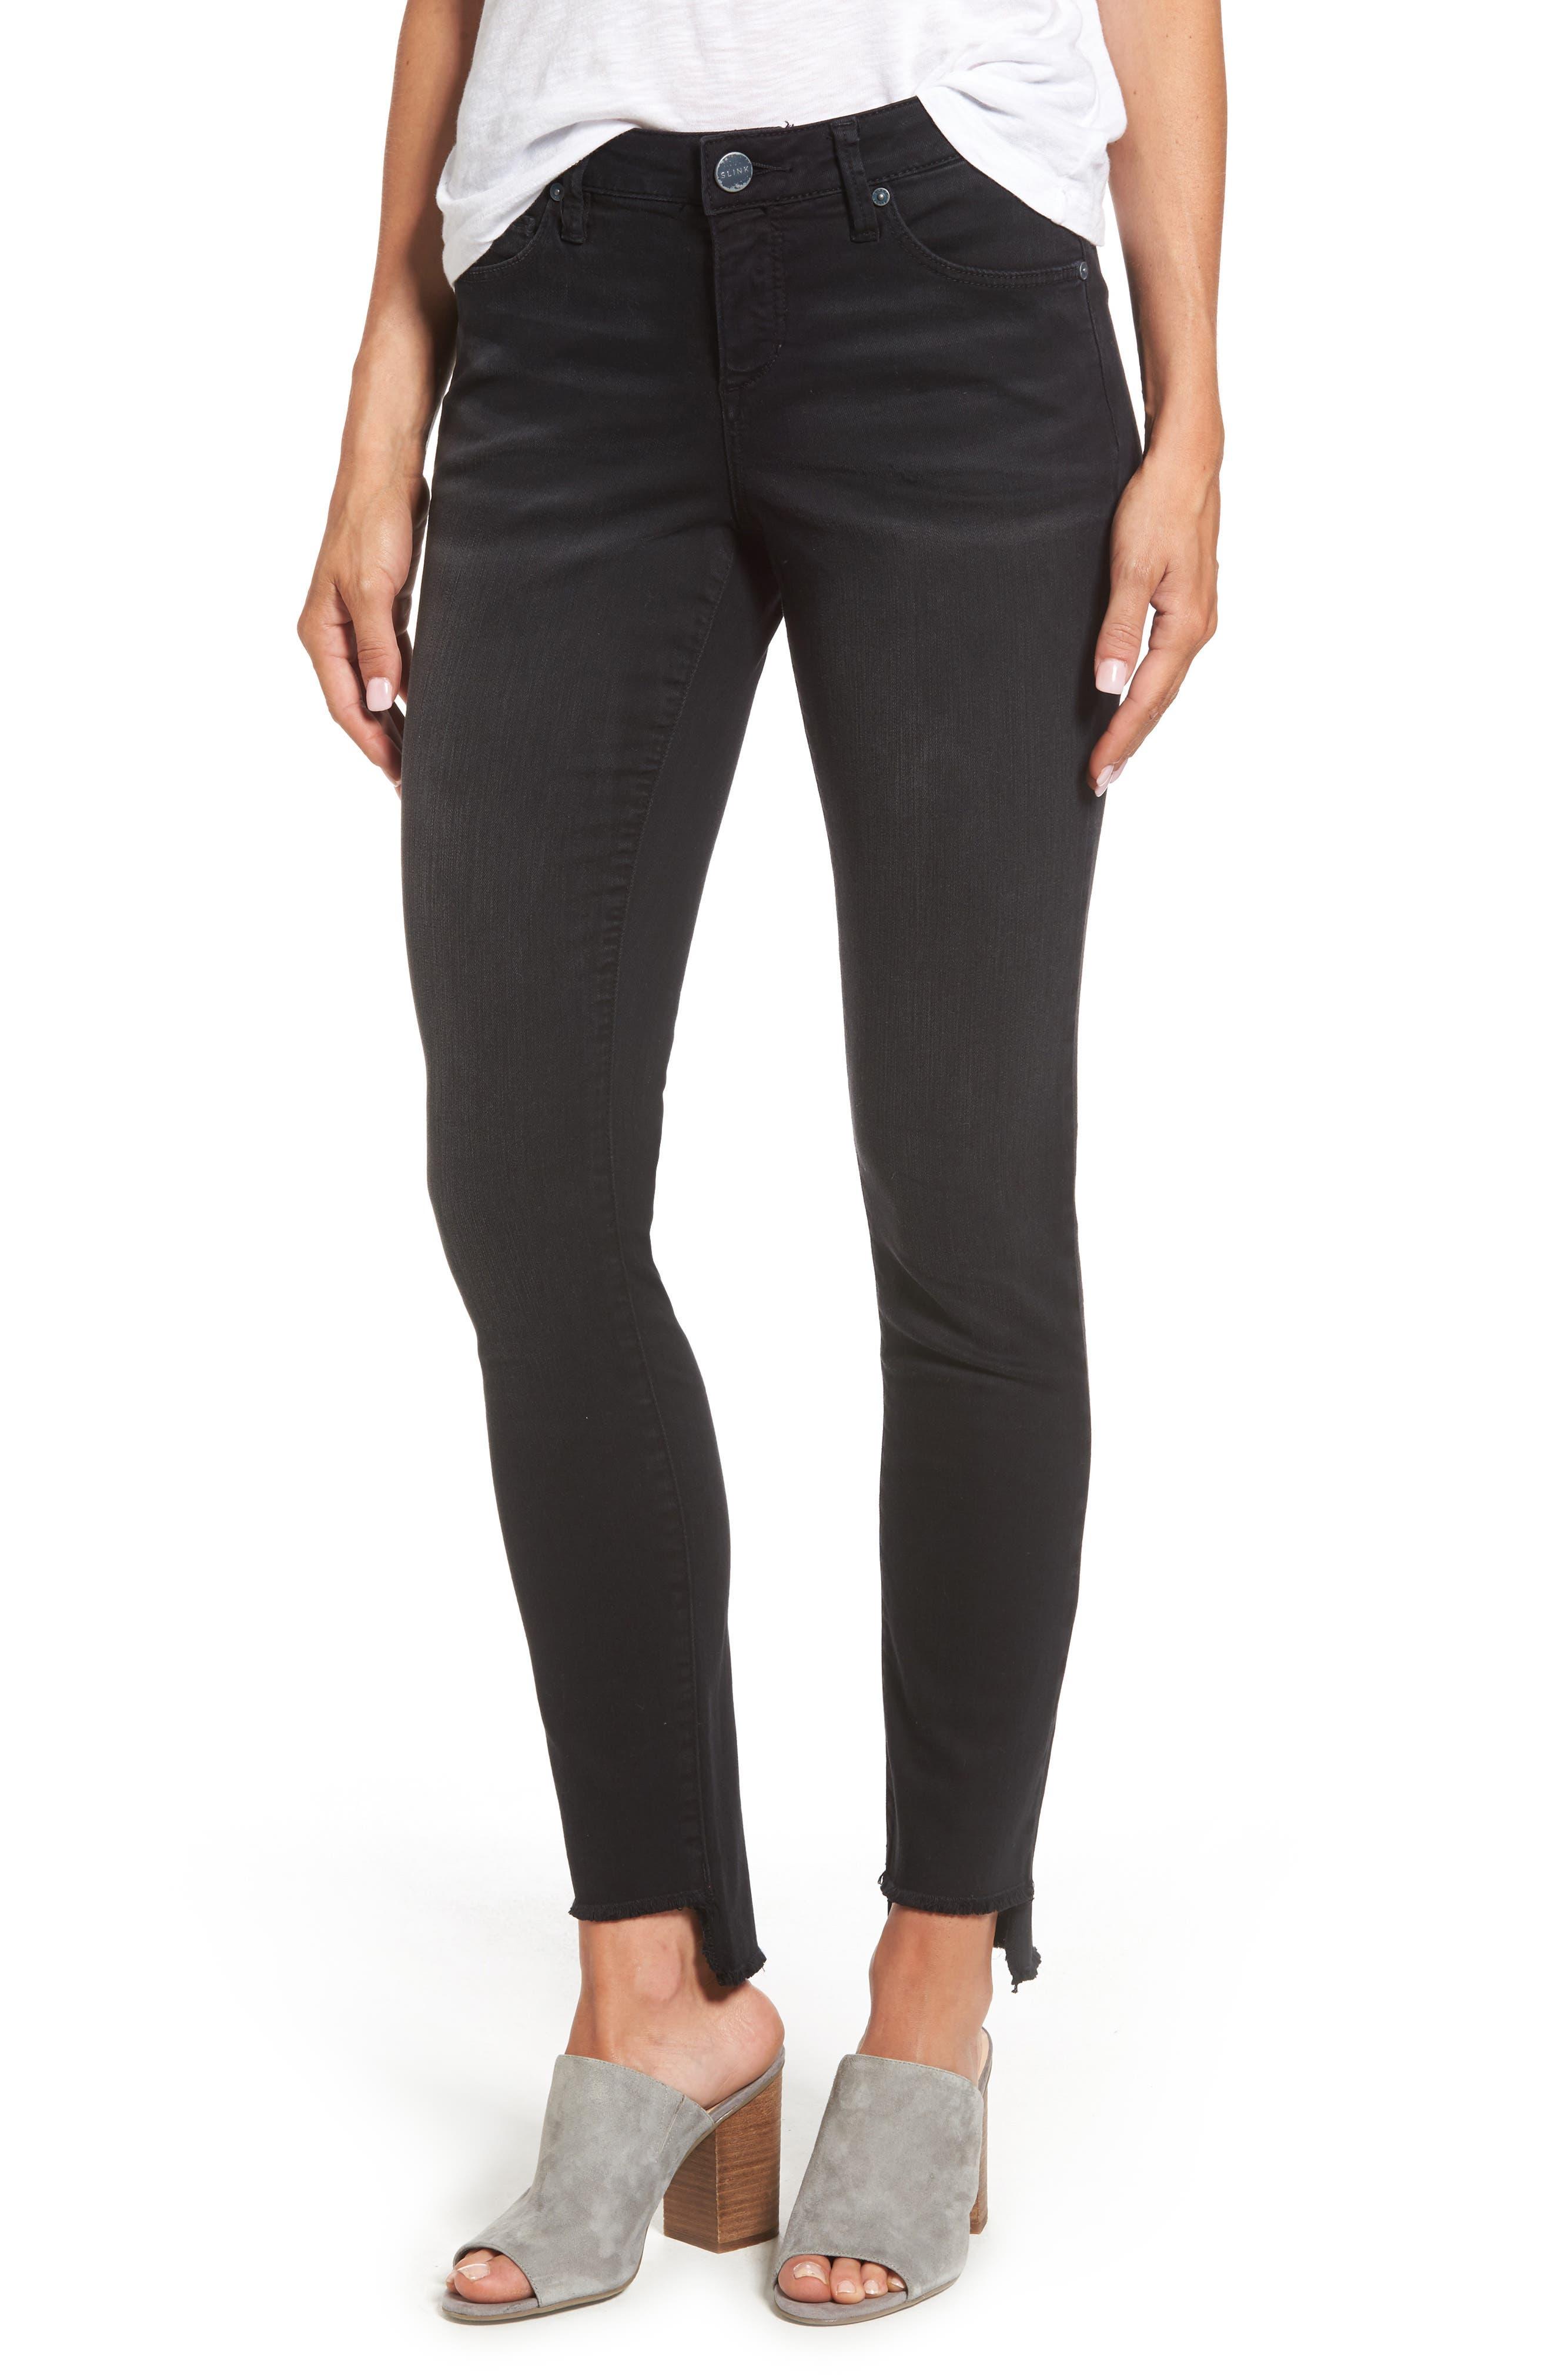 Alternate Image 1 Selected - SLINK Jeans Step Hem Skinny Jeans (Mimi)